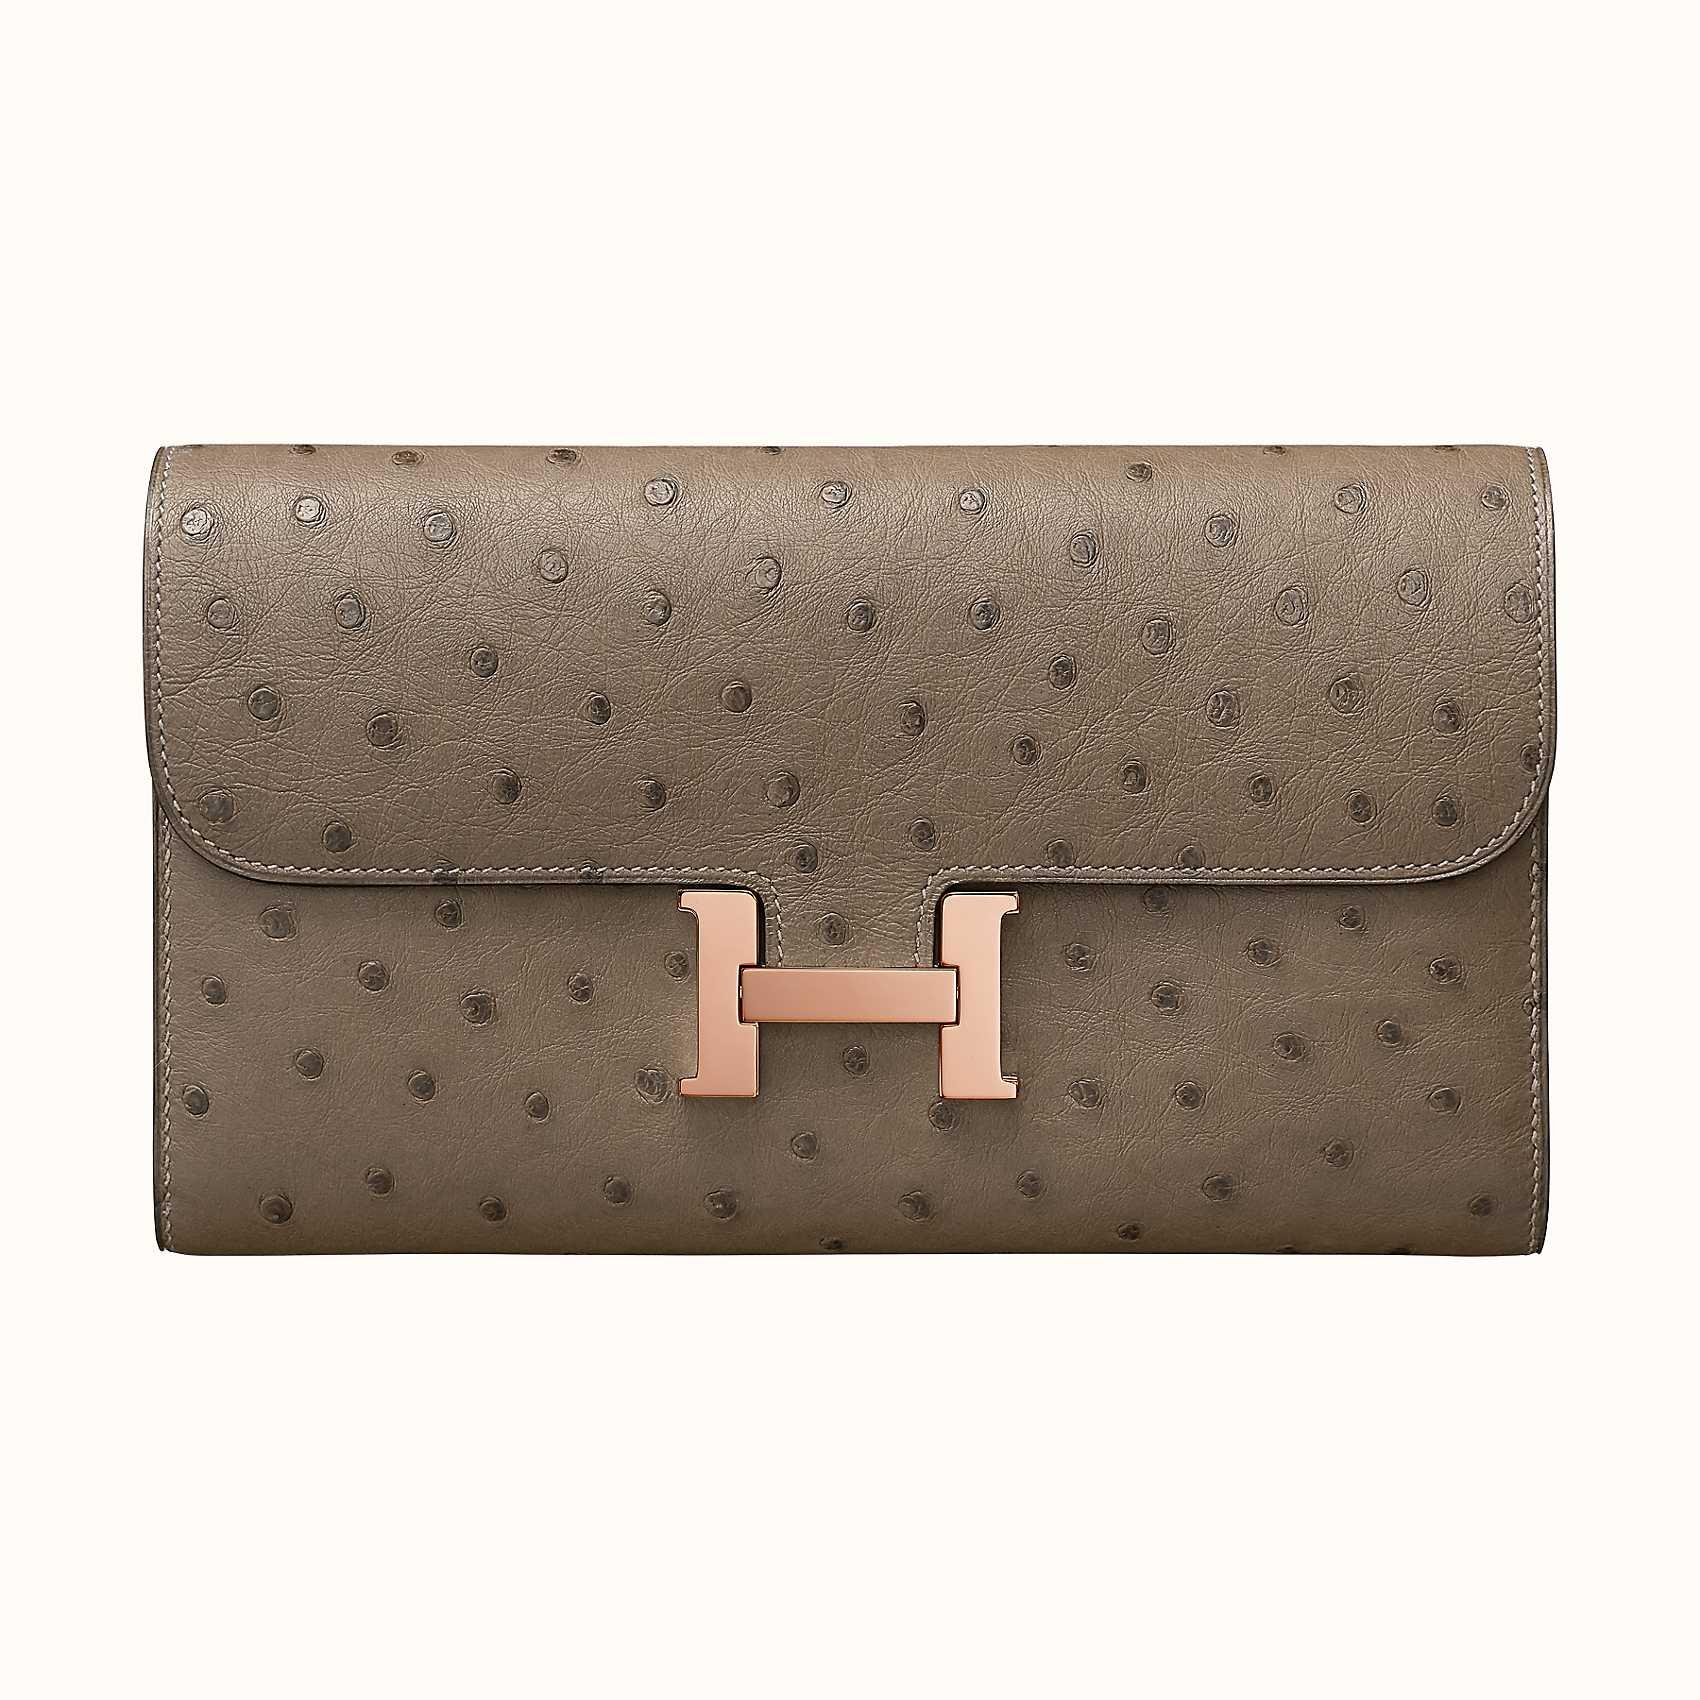 Hong Kong Hermes Portafoglio Constance LongCDM8Gris Asphalte